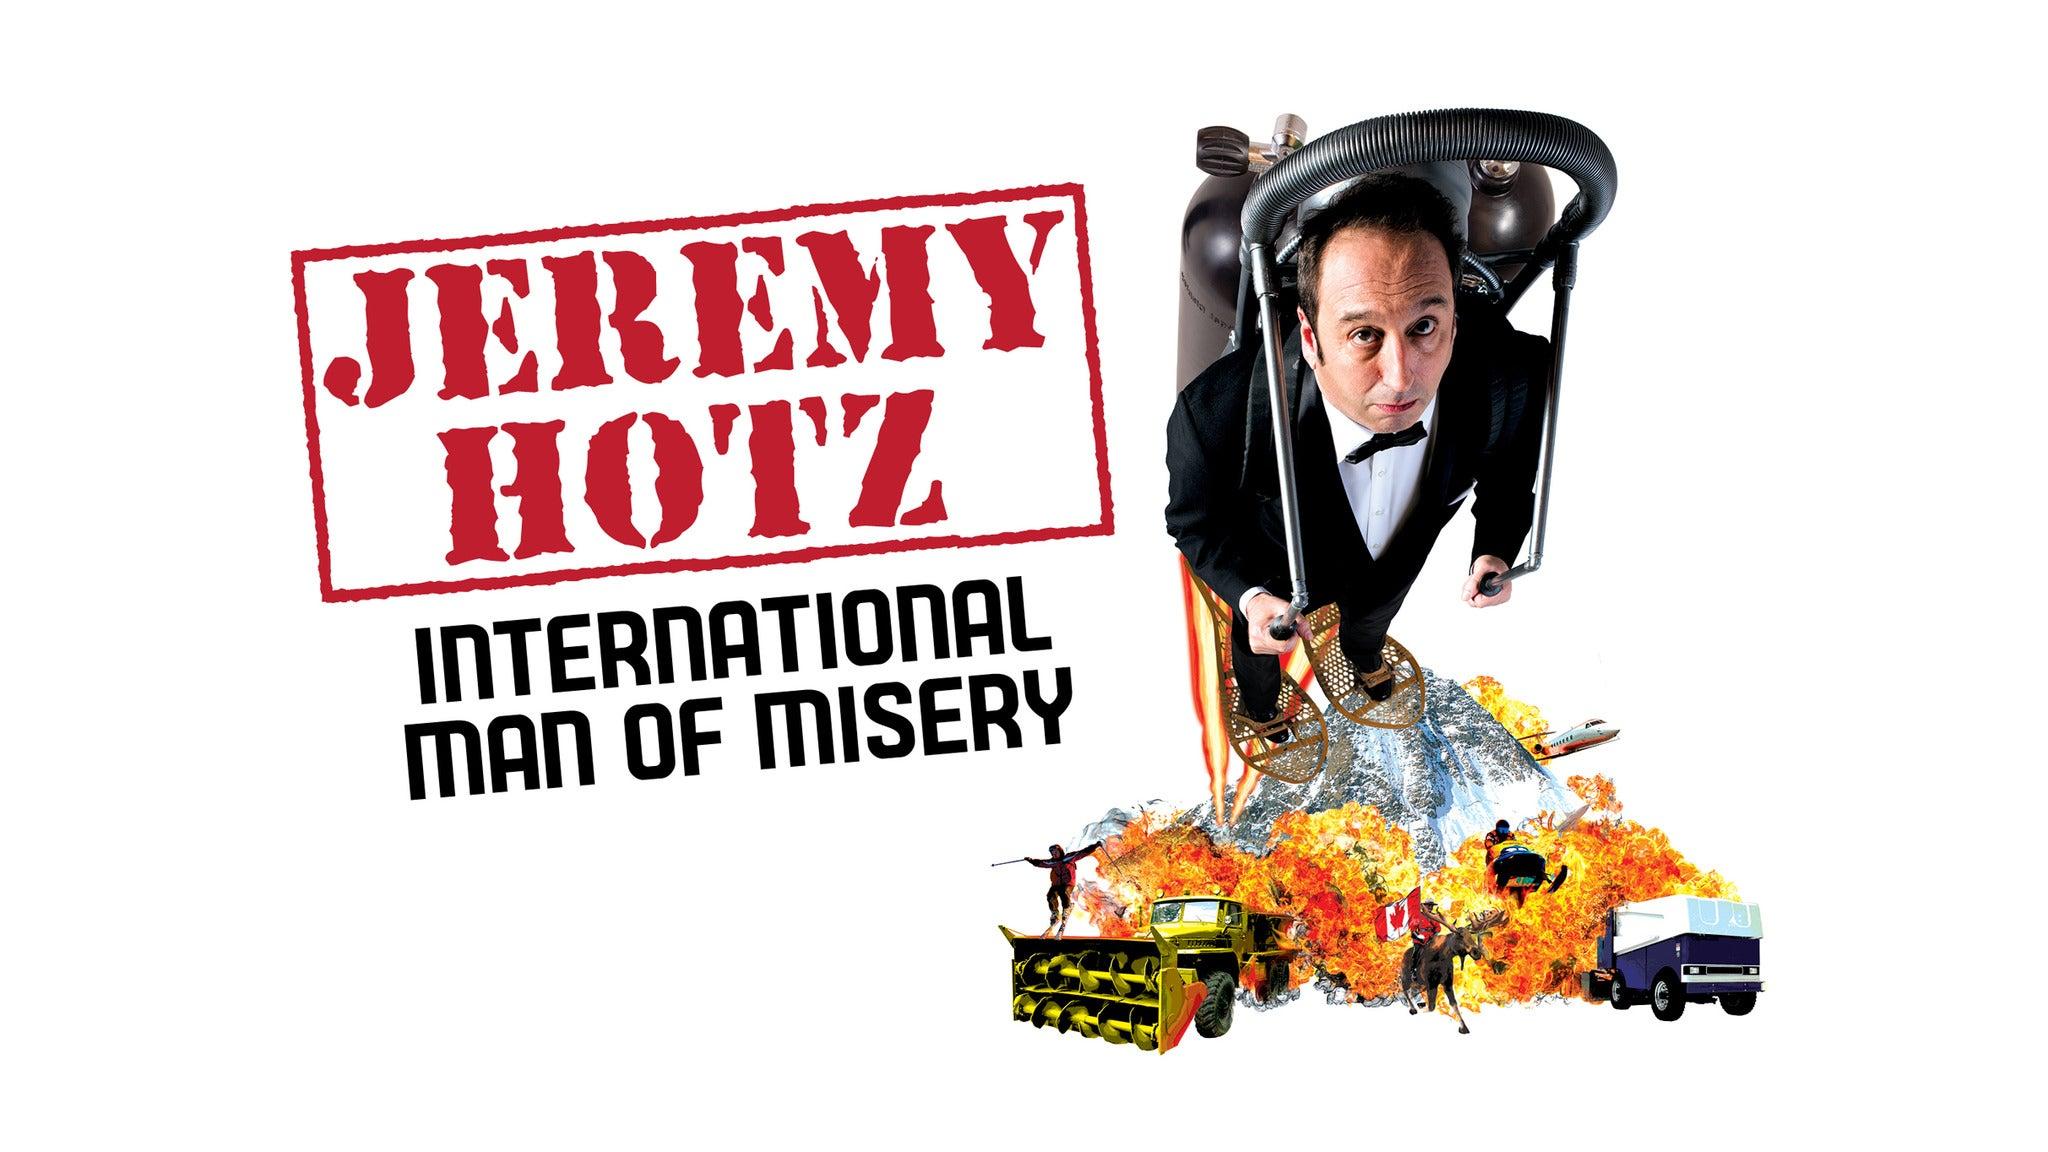 Jeremy Hotz at Irvine Improv